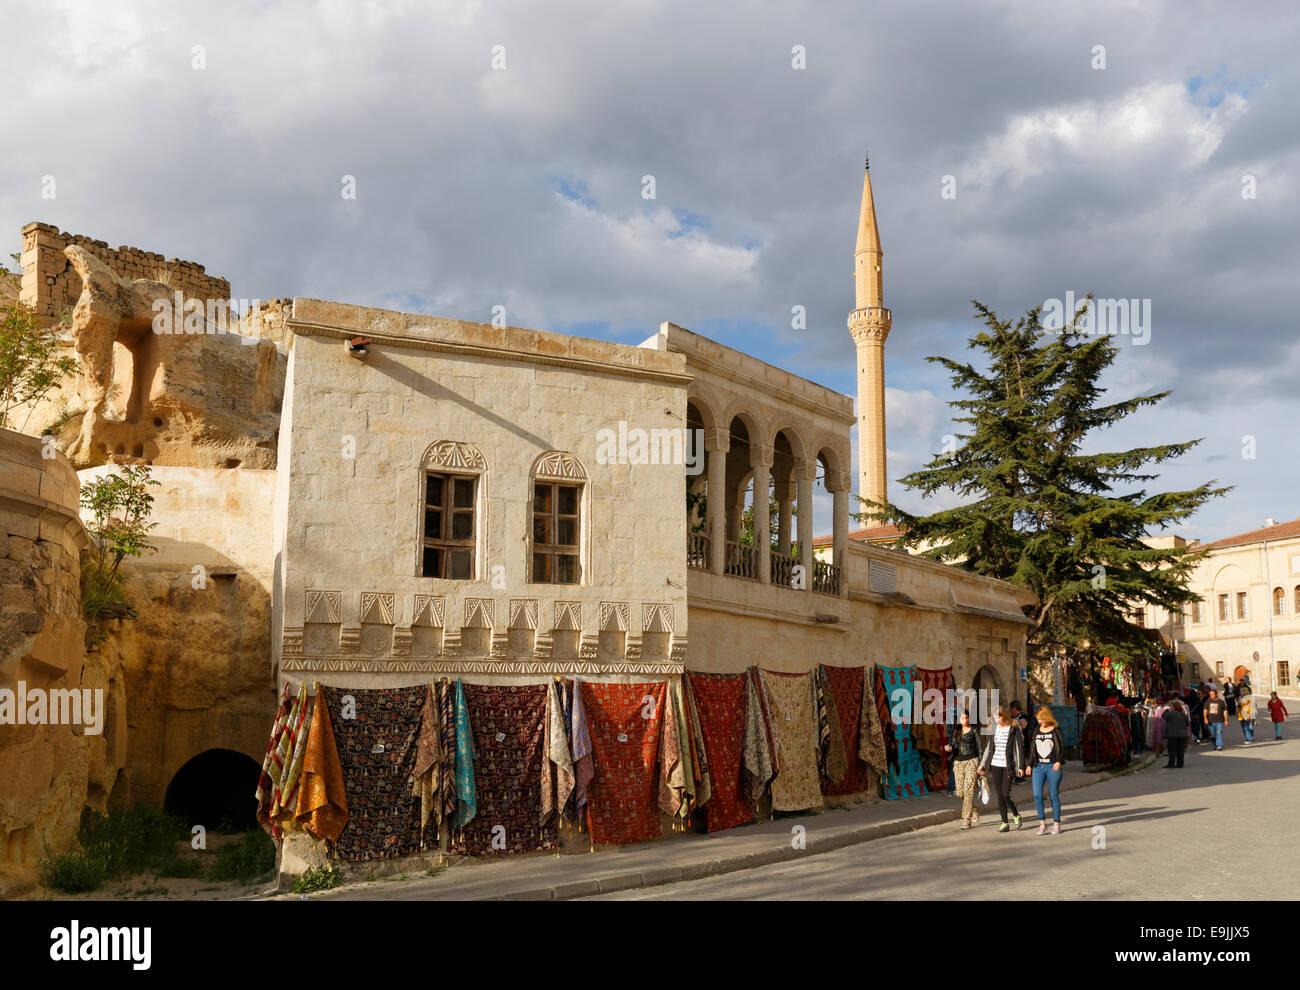 Street scene, Mustafapaşa, Nevşehir Province, Cappadocia, Central Anatolia Region, Anatolia, Turkey - Stock Image